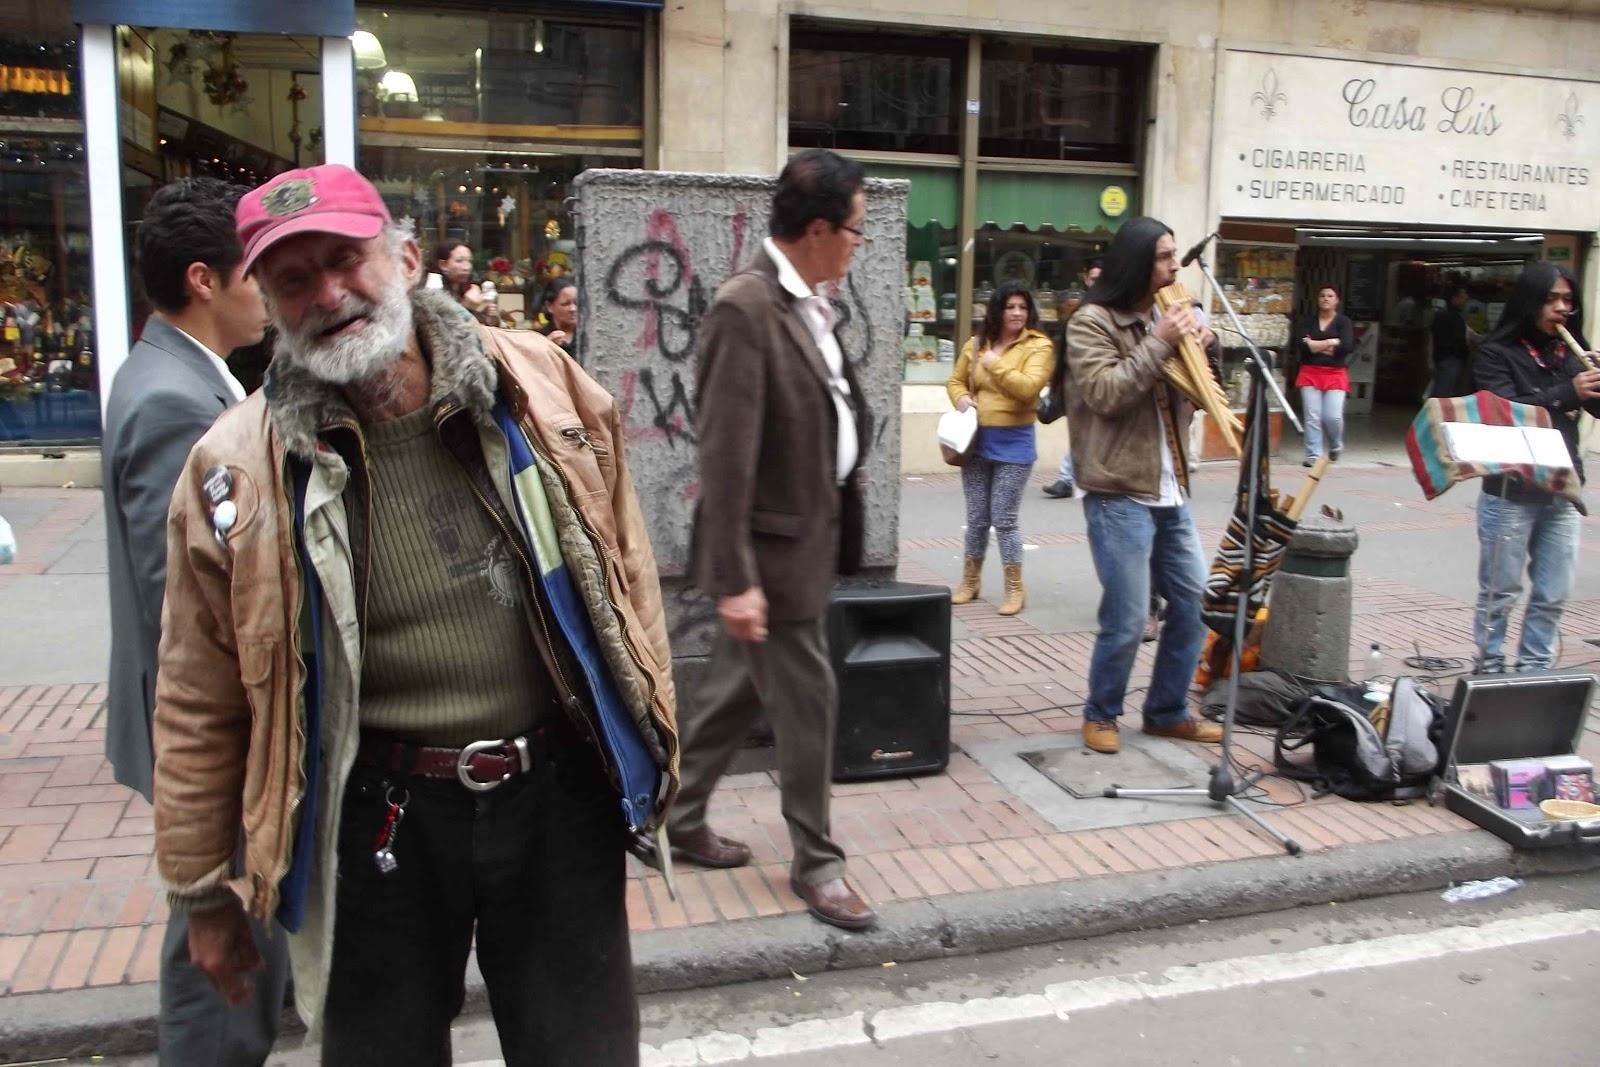 Happy homeless guy